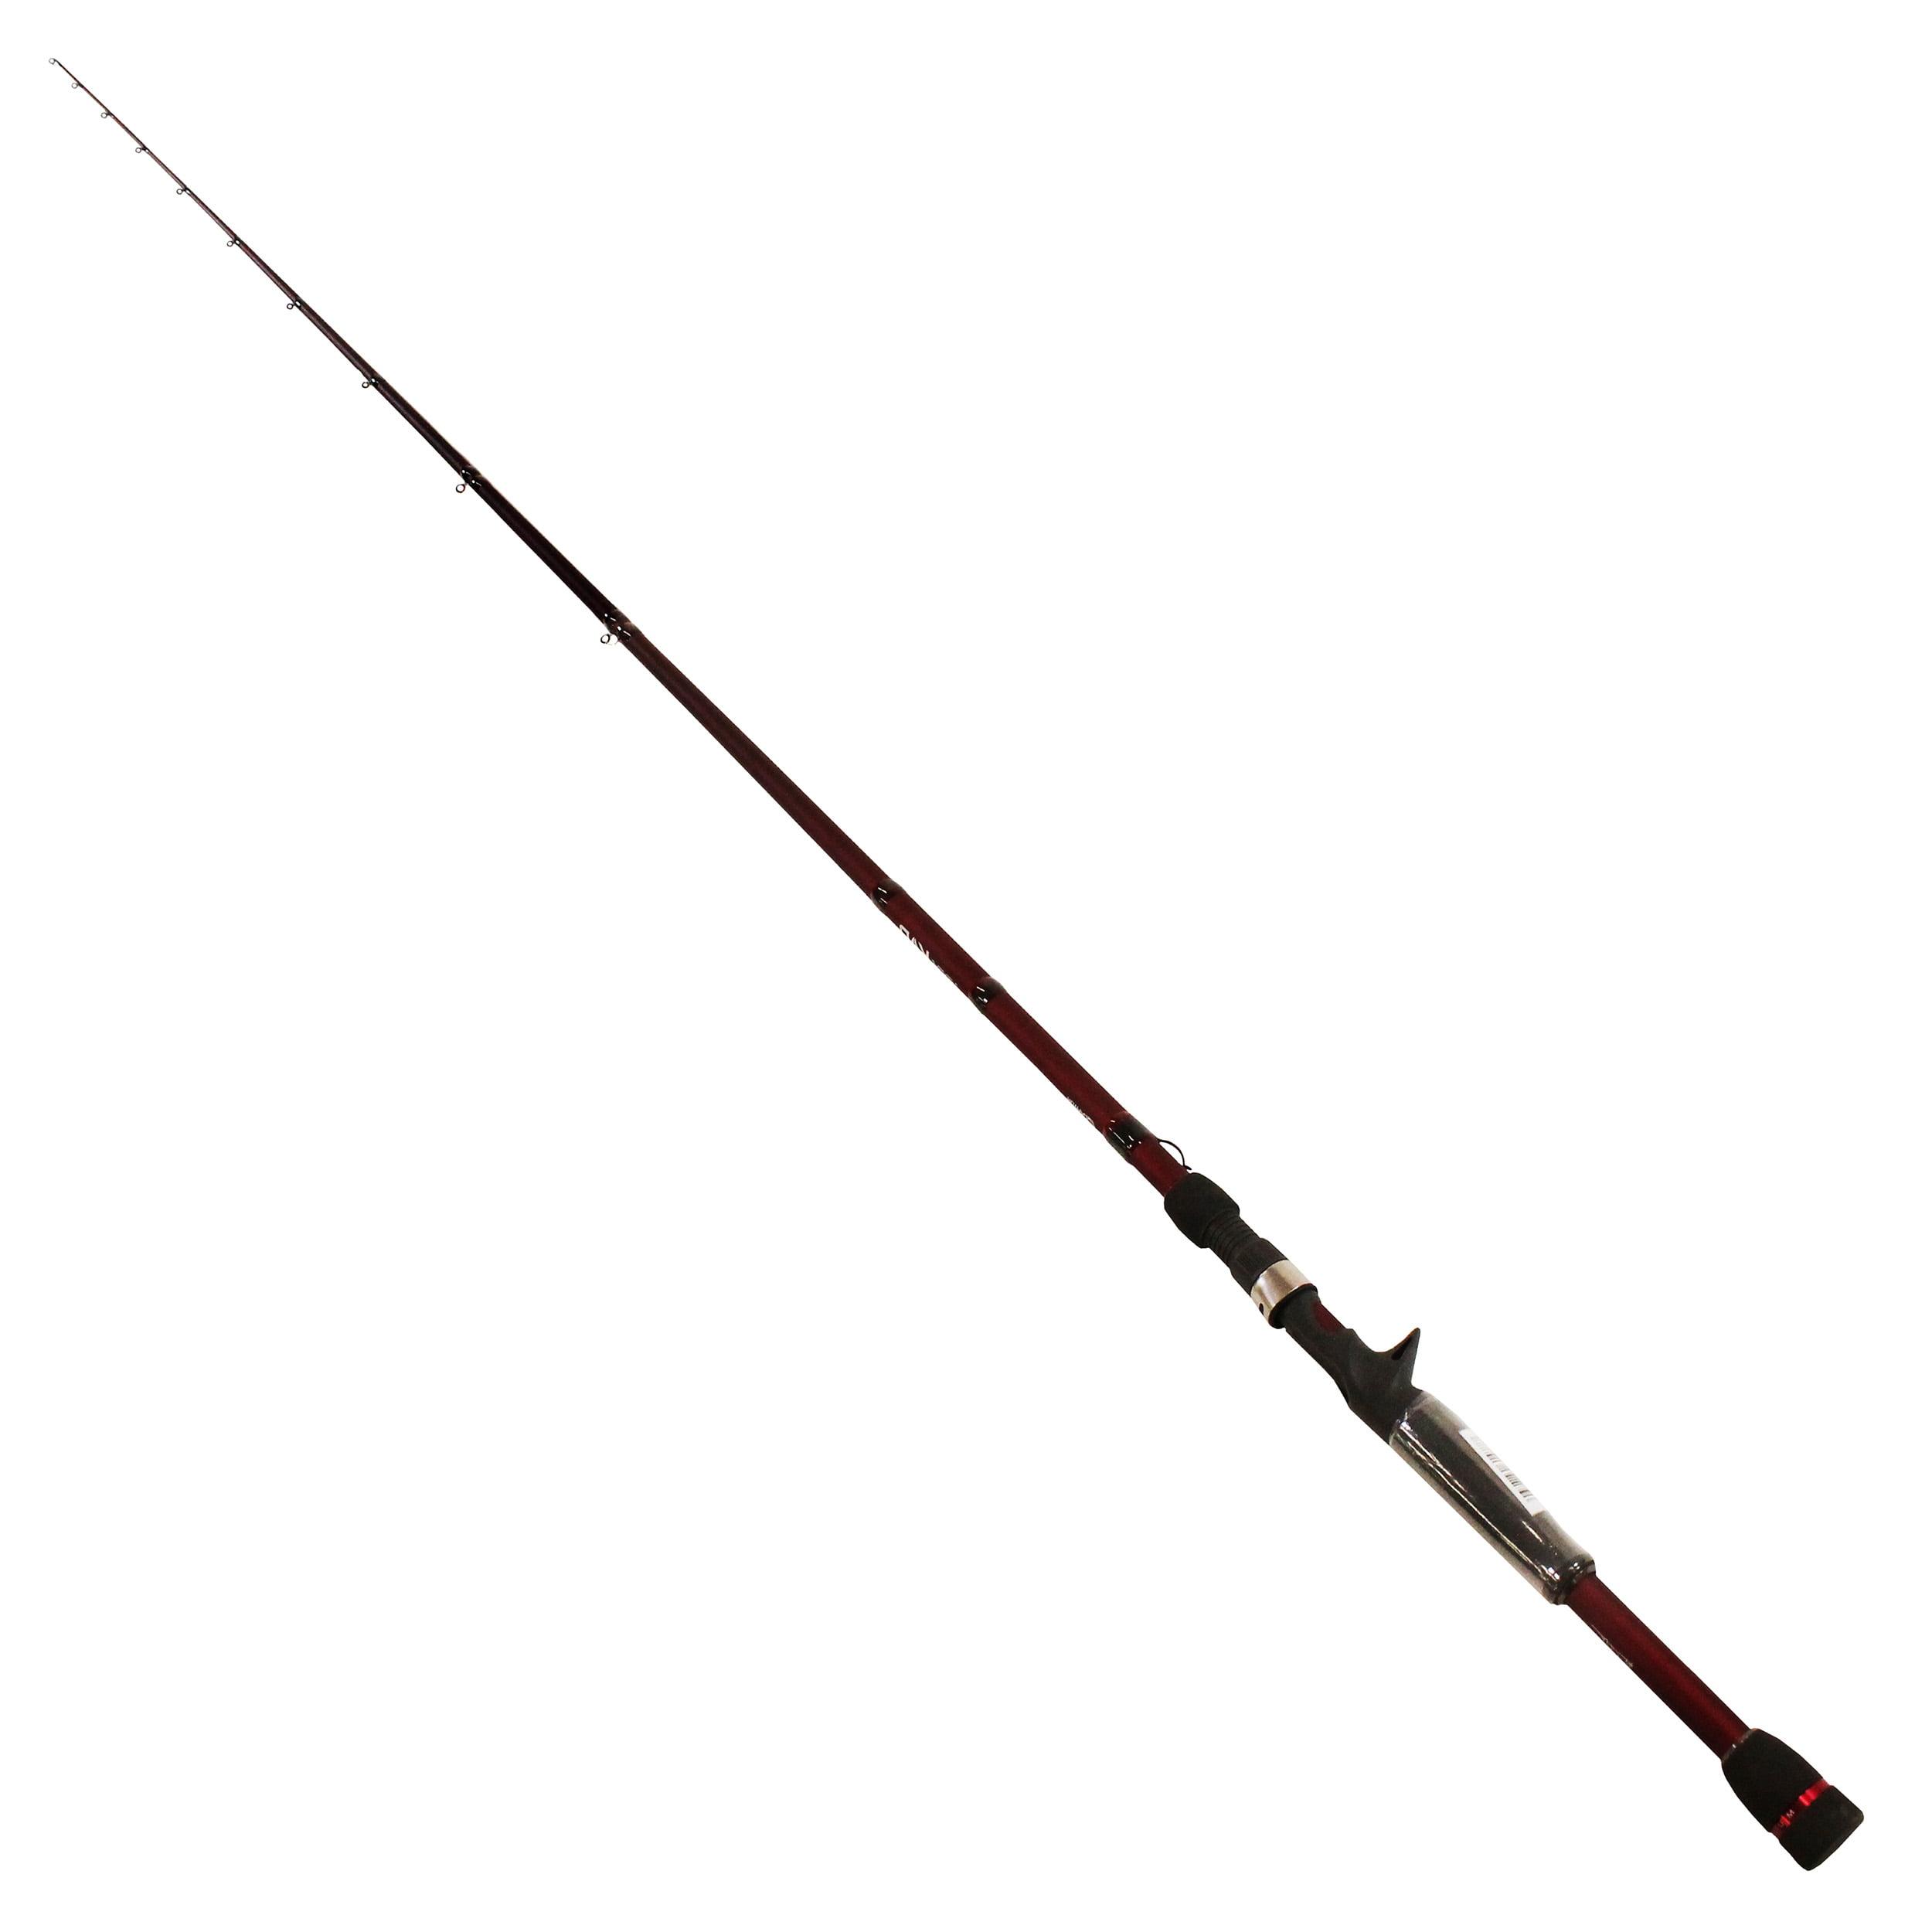 7' 1pc Med Kvd Cranking Rod